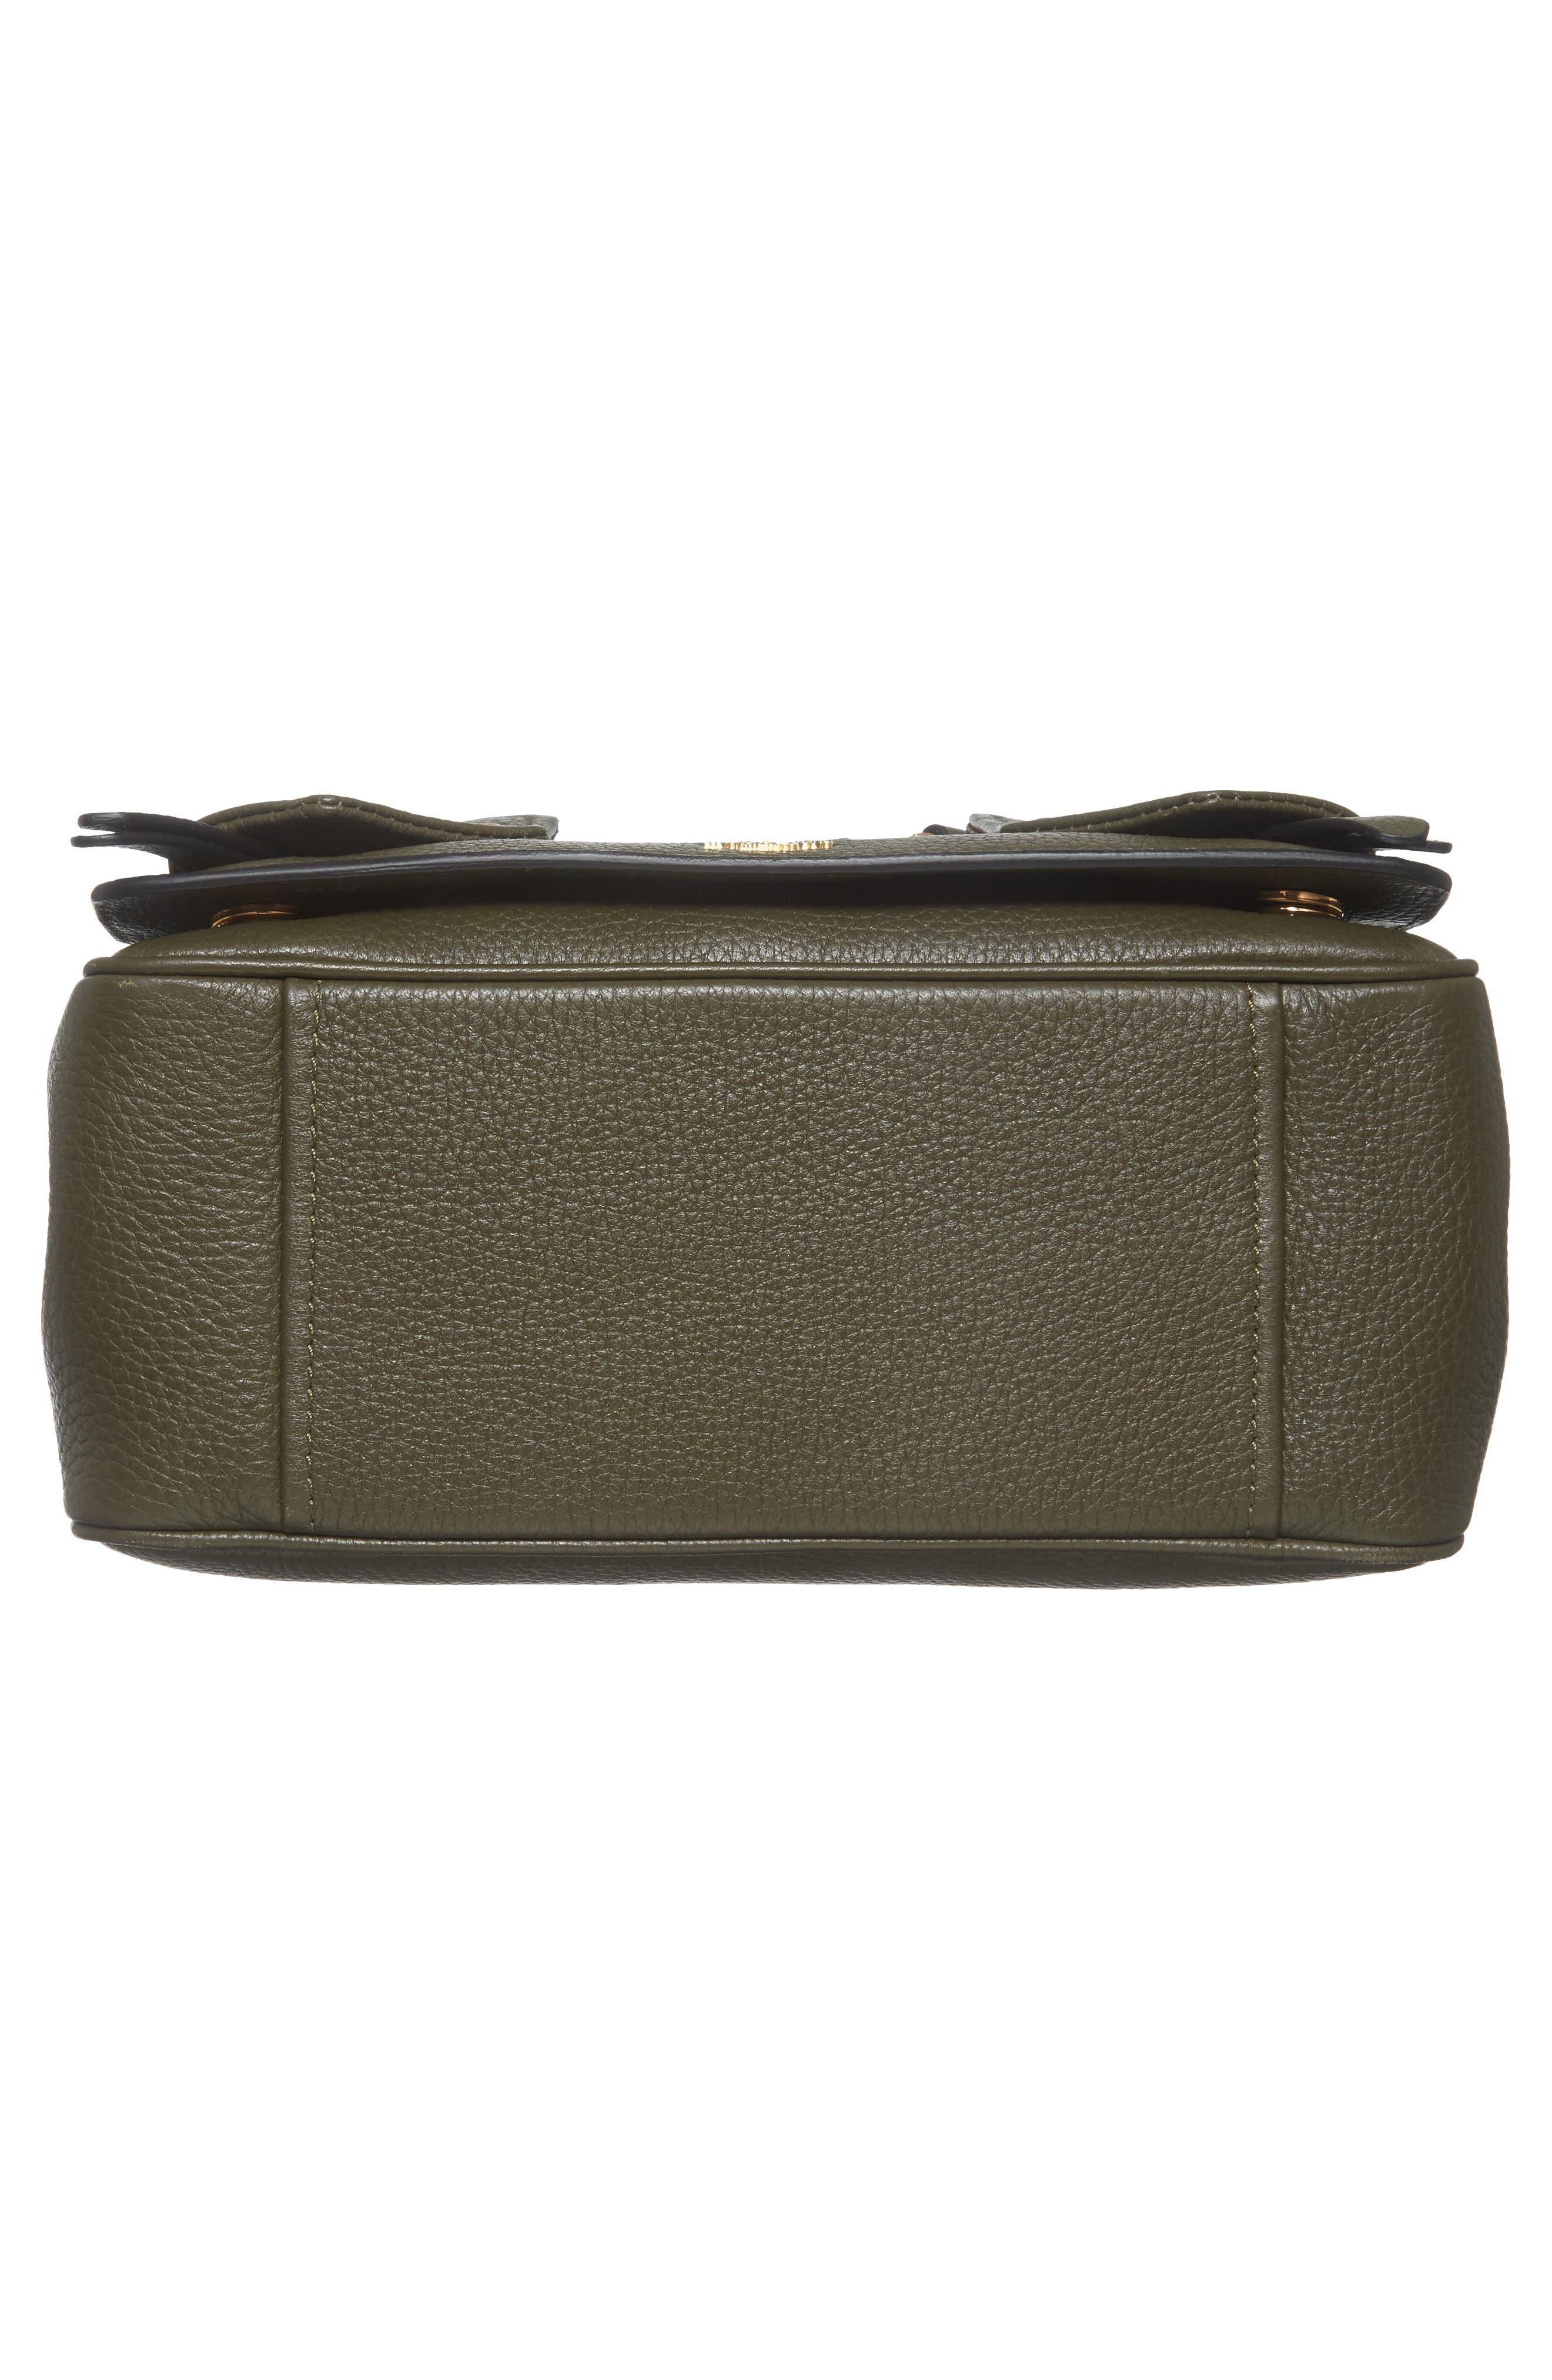 Grainy-B Leather Crossbody Bag,                             Alternate thumbnail 11, color,